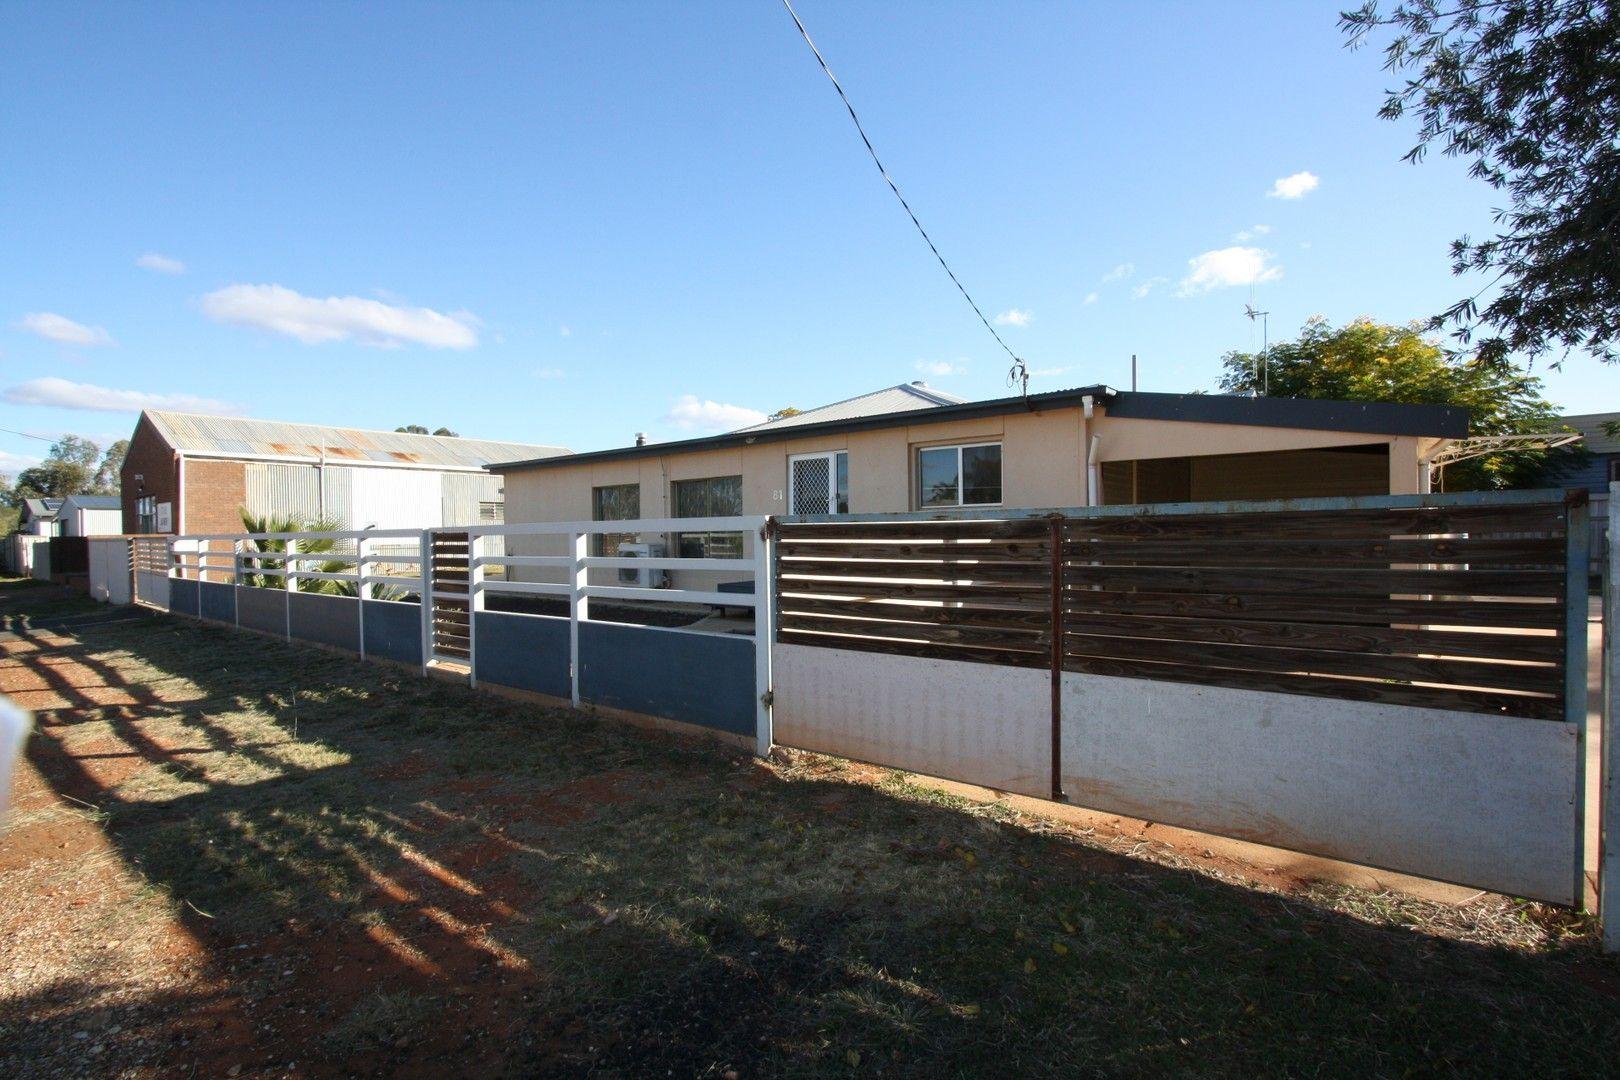 81 MONAGHAN ST, Cobar NSW 2835, Image 0